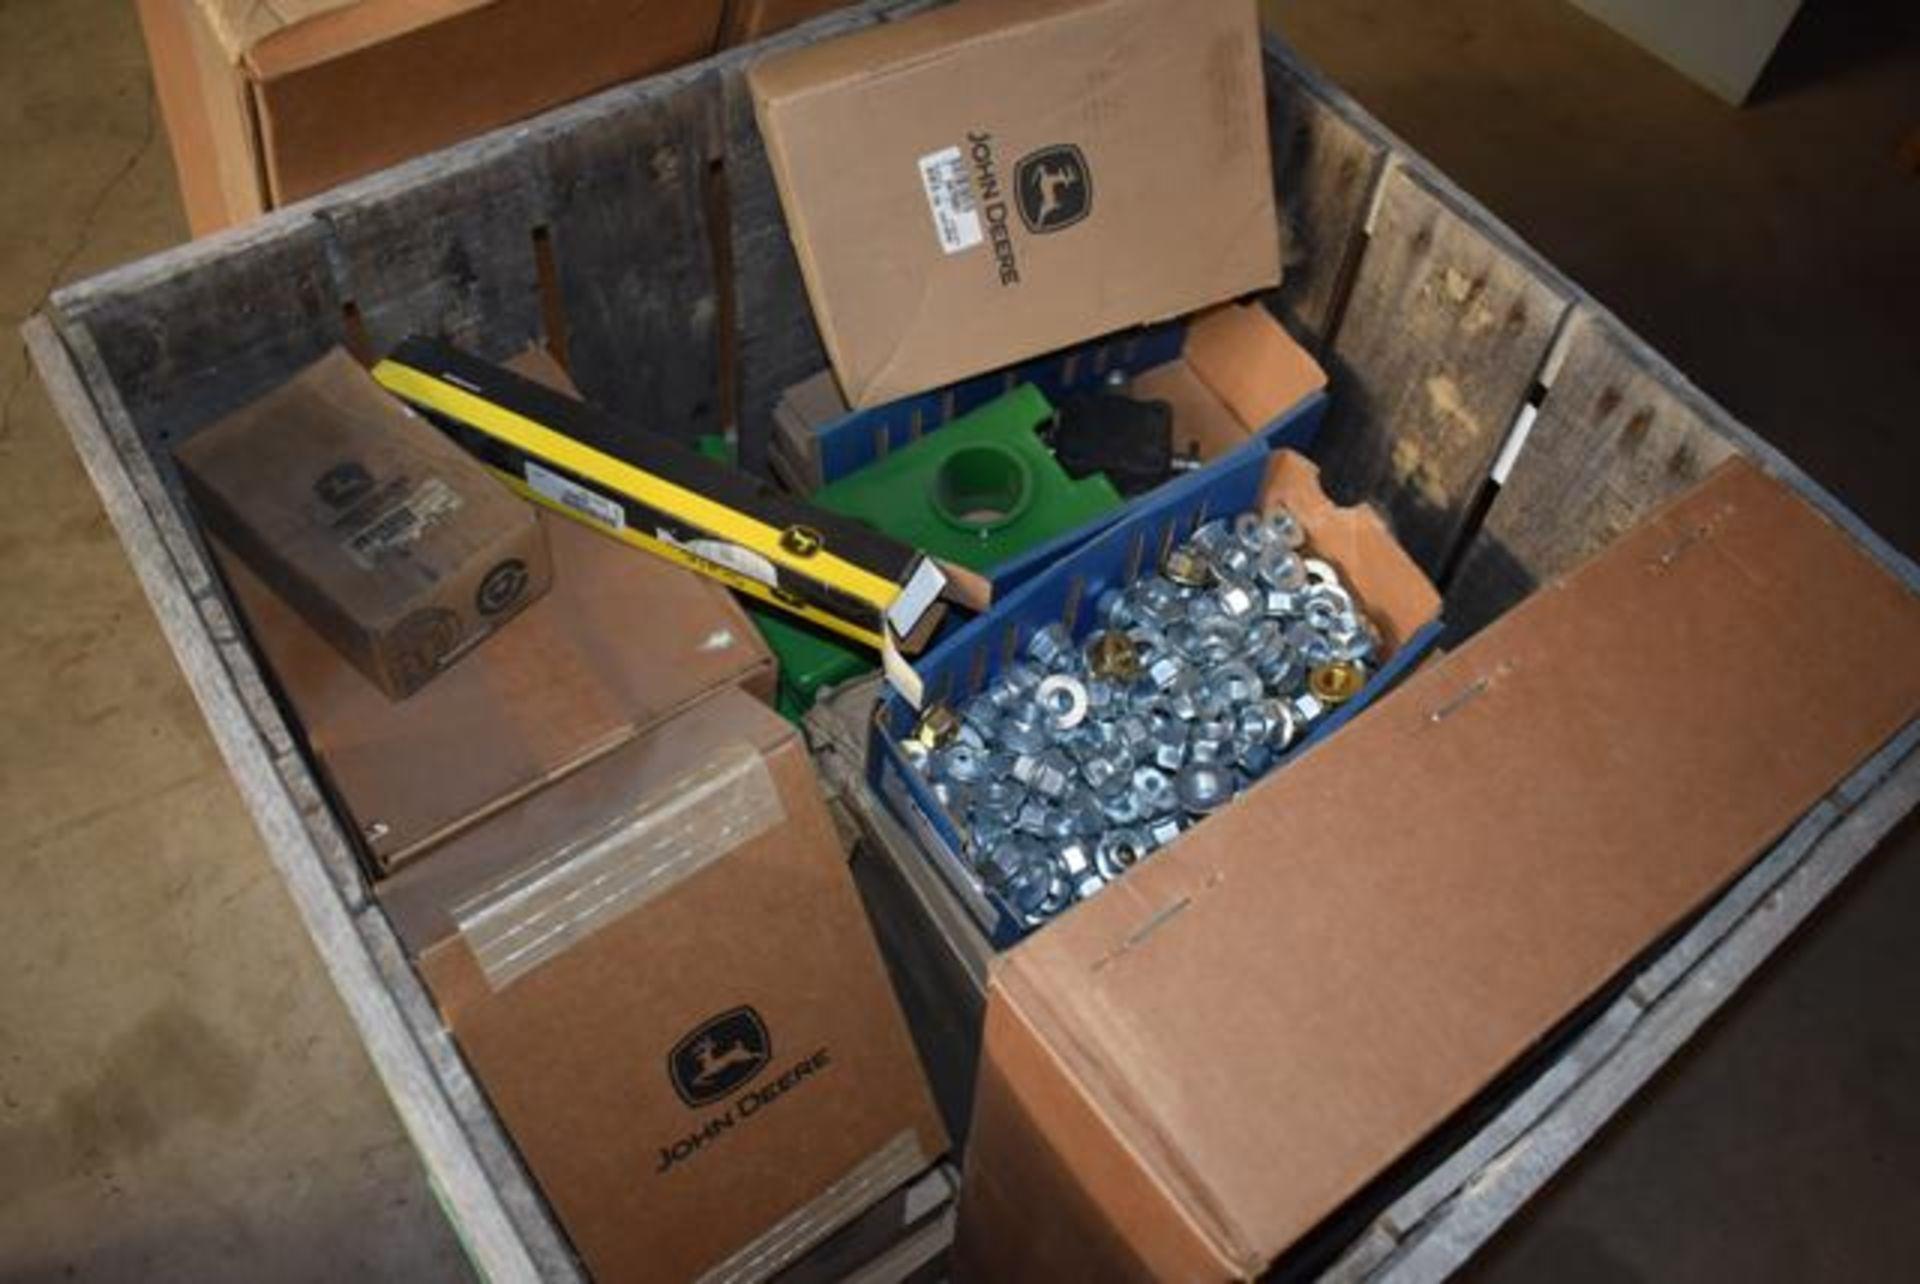 (Located in Sleepy Eye, MN) John Deere Parts & Components - Image 2 of 2